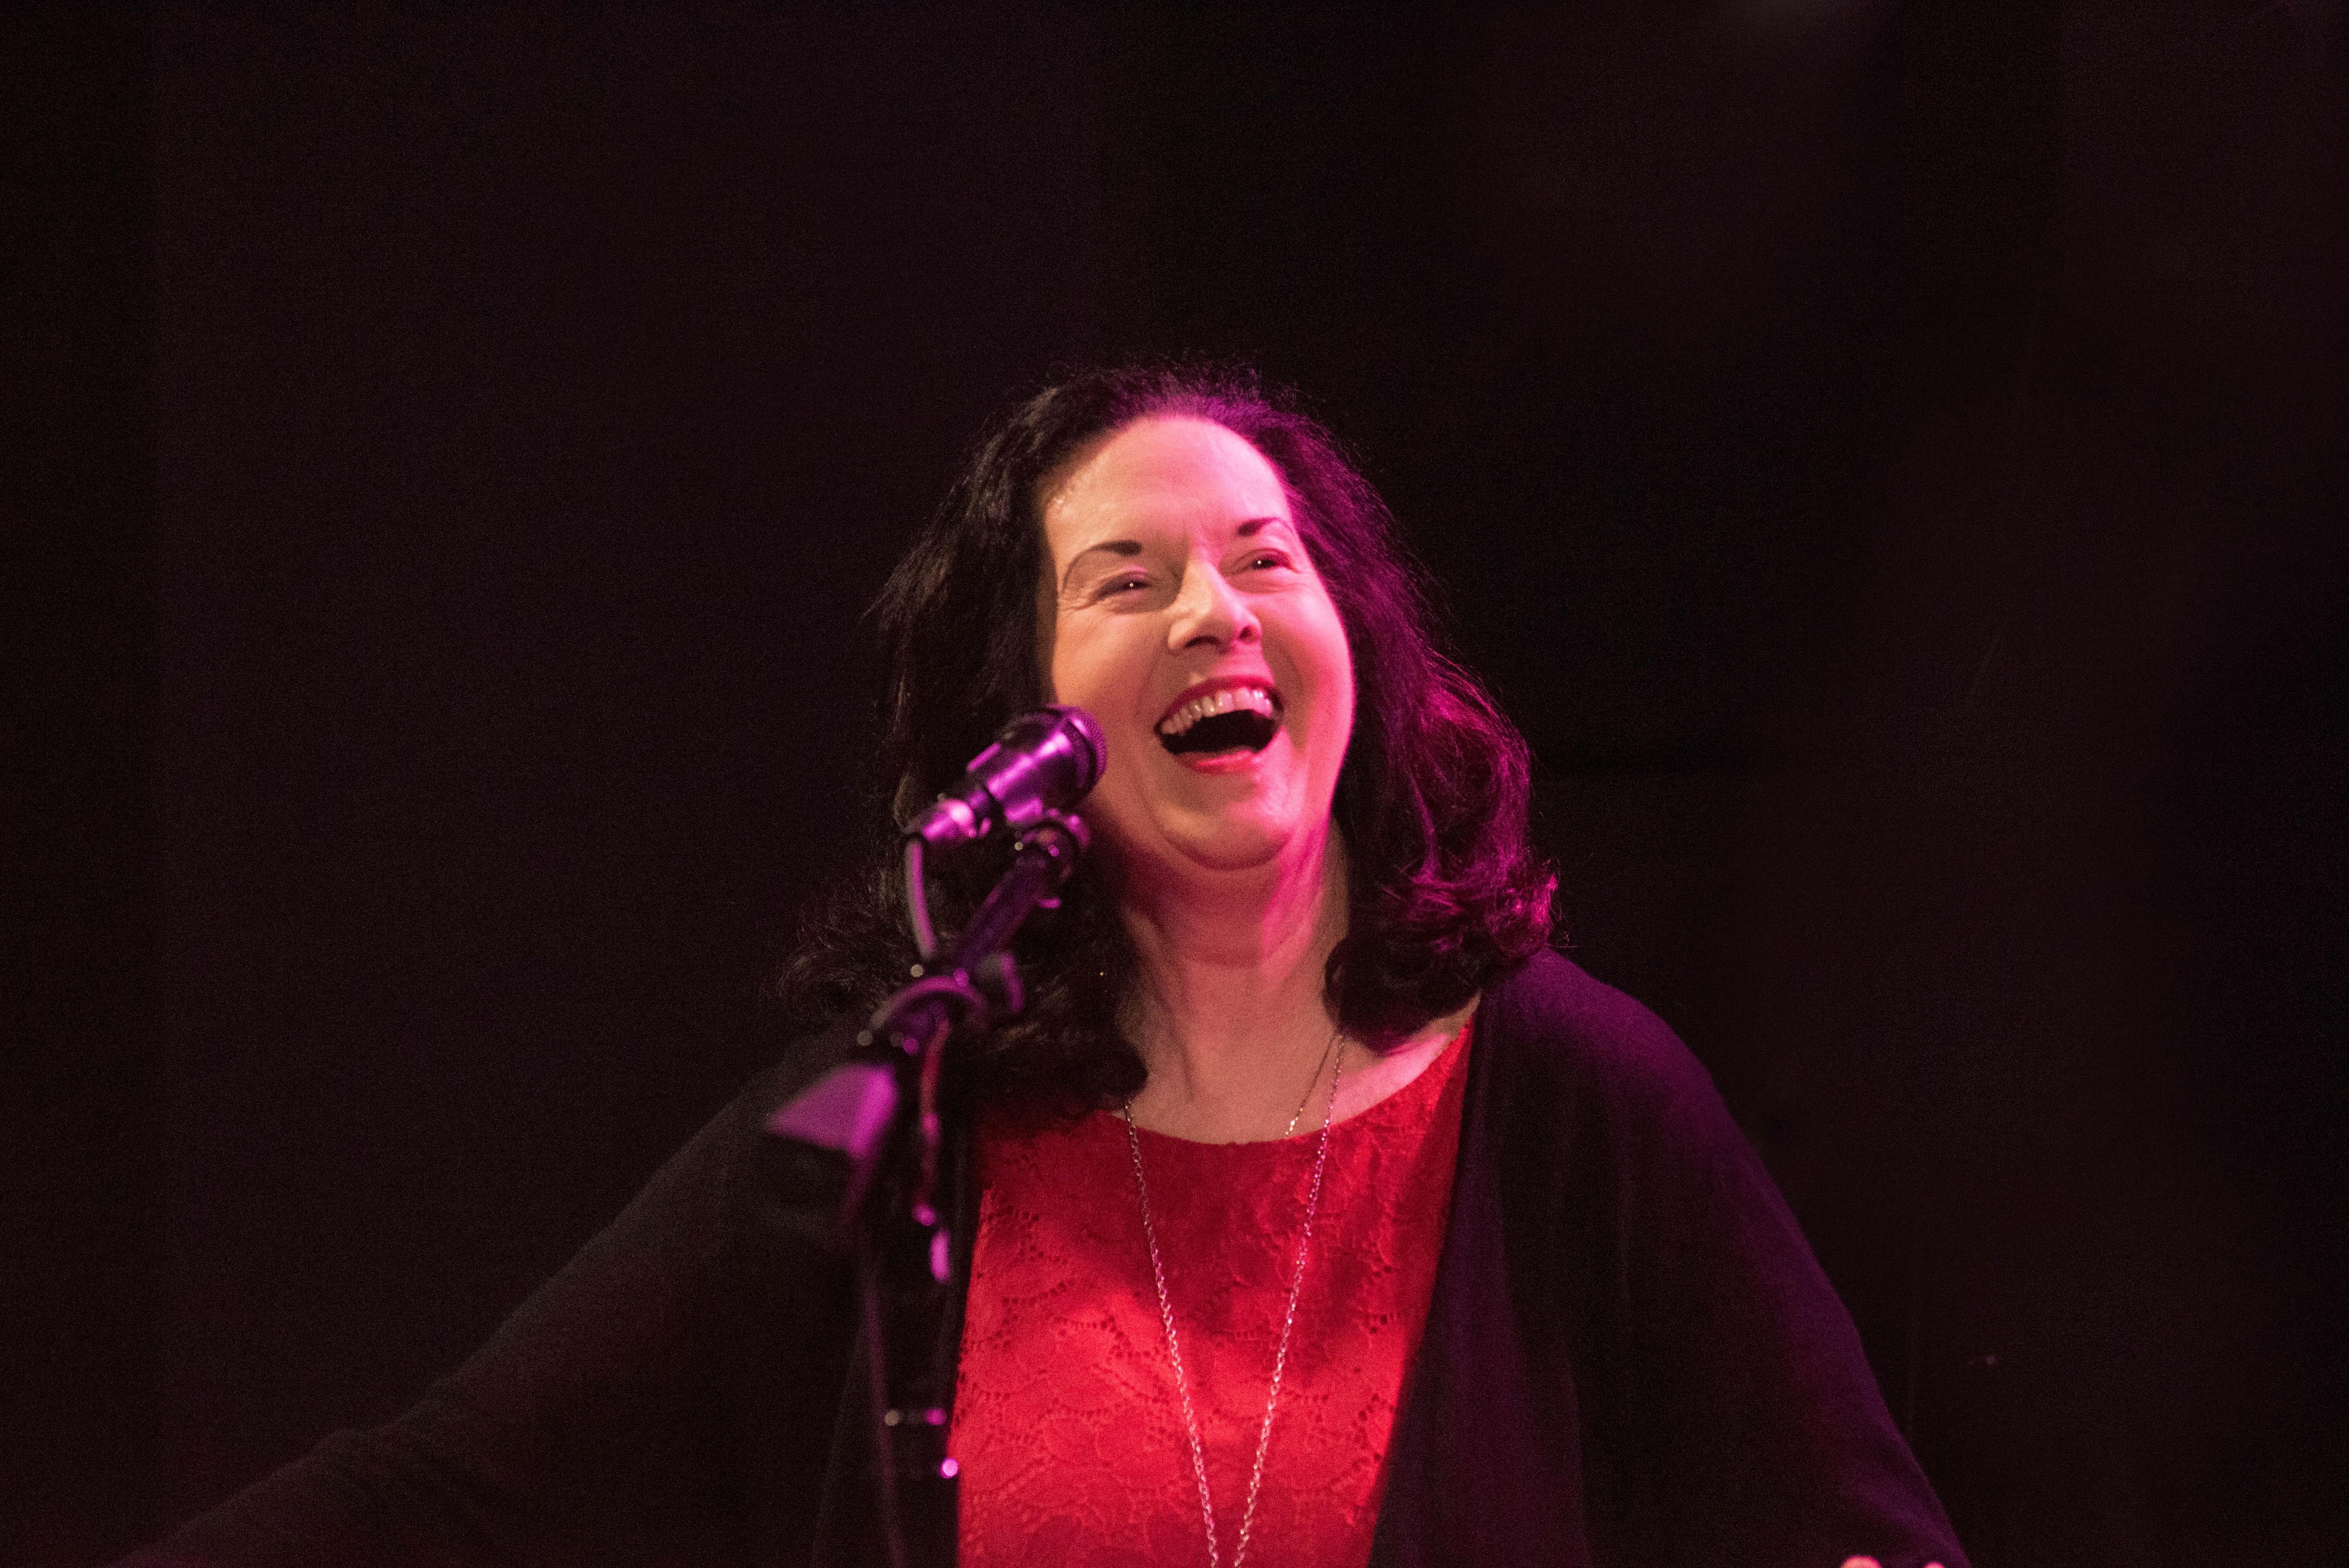 Linda Gail Lewis